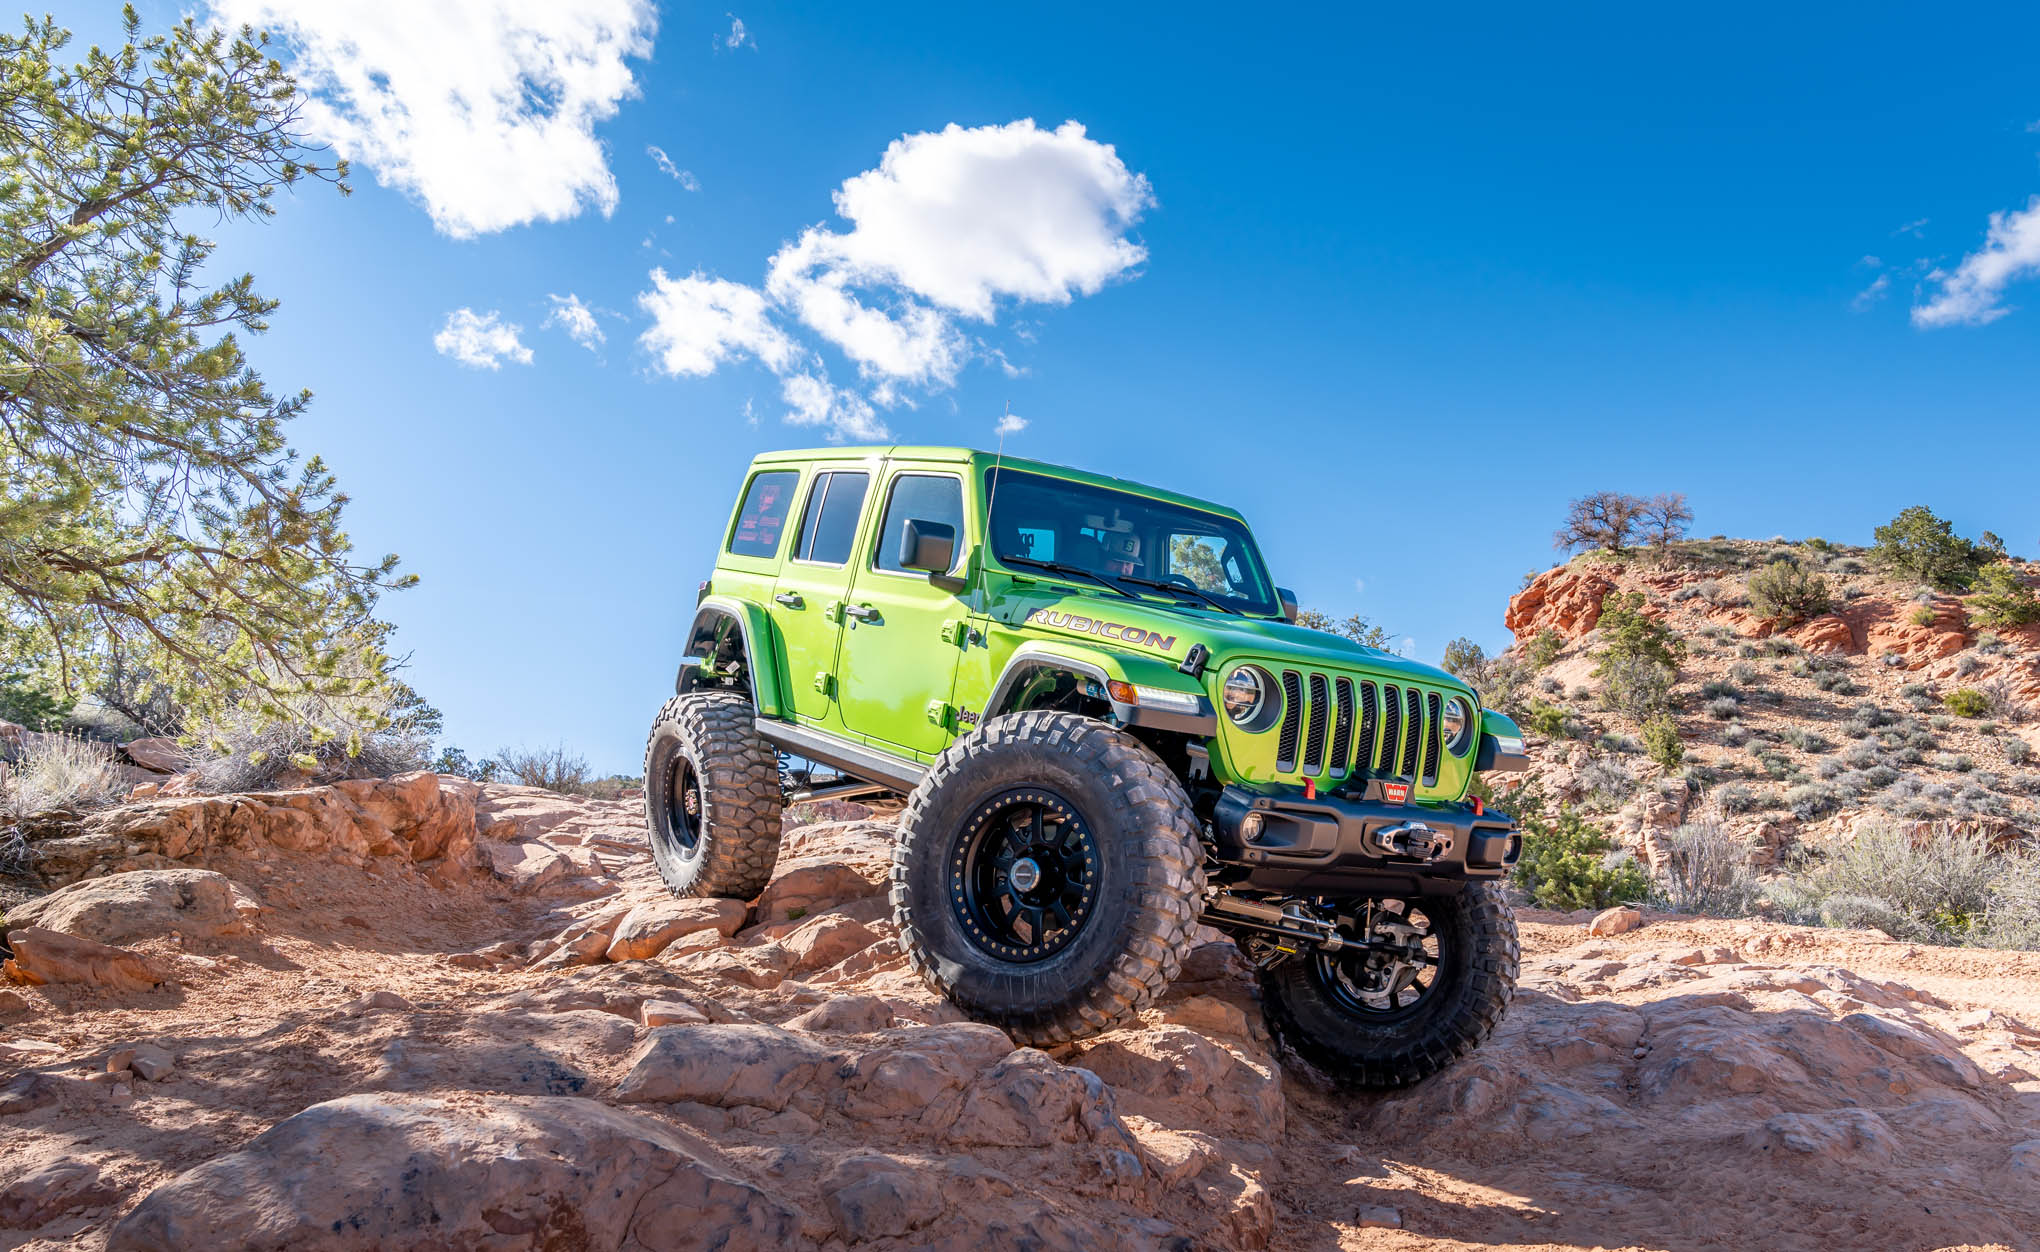 0022 2018 jeep wrangler unlimited rubicon dynatrac prorock 42 dixie 4 wheel drive